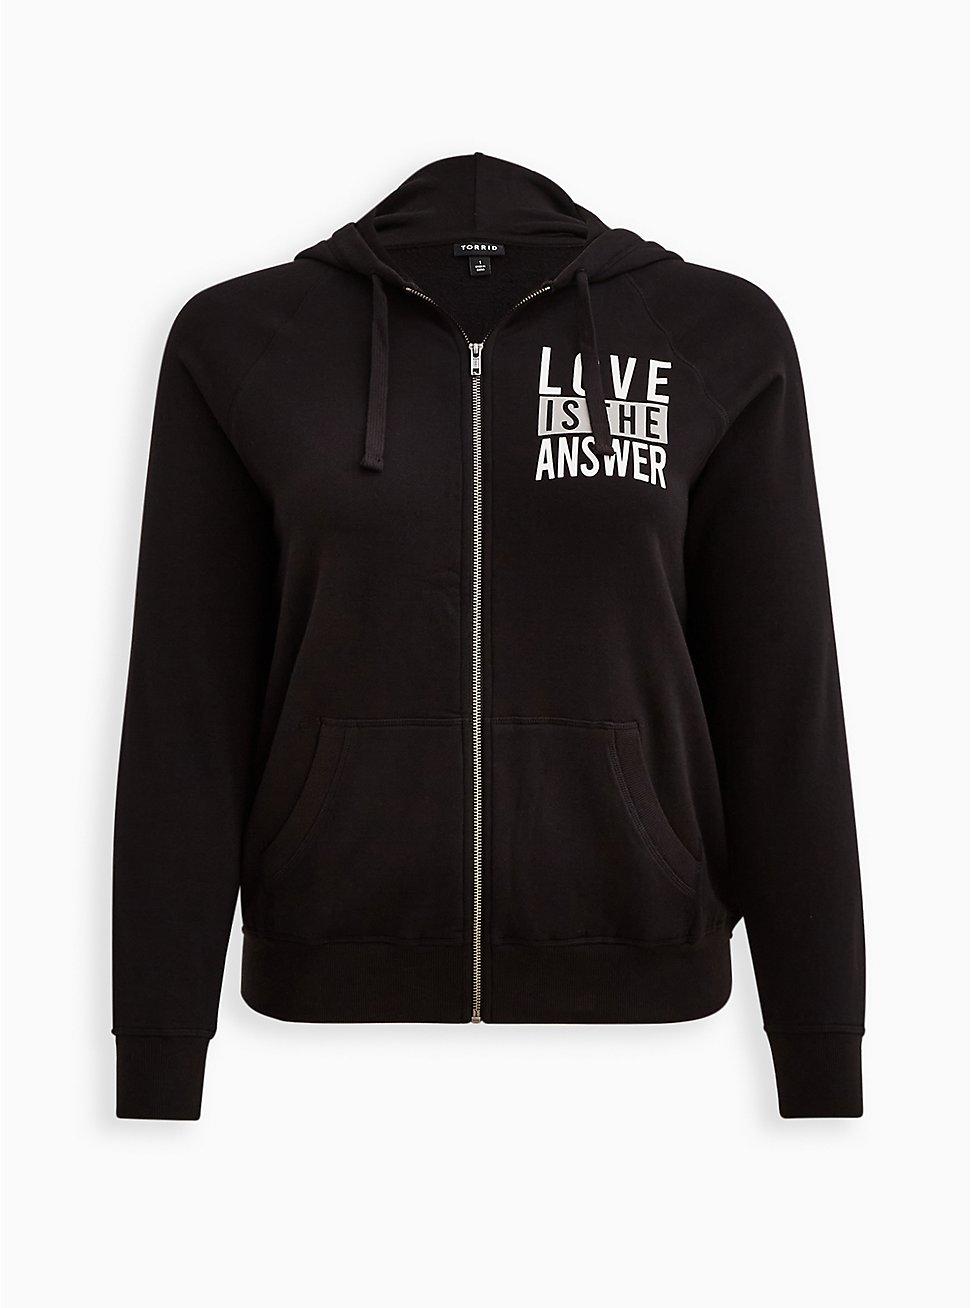 Zip-Up Hoodie - Ultra Soft Fleece Love Is The Answer Black, DEEP BLACK, hi-res